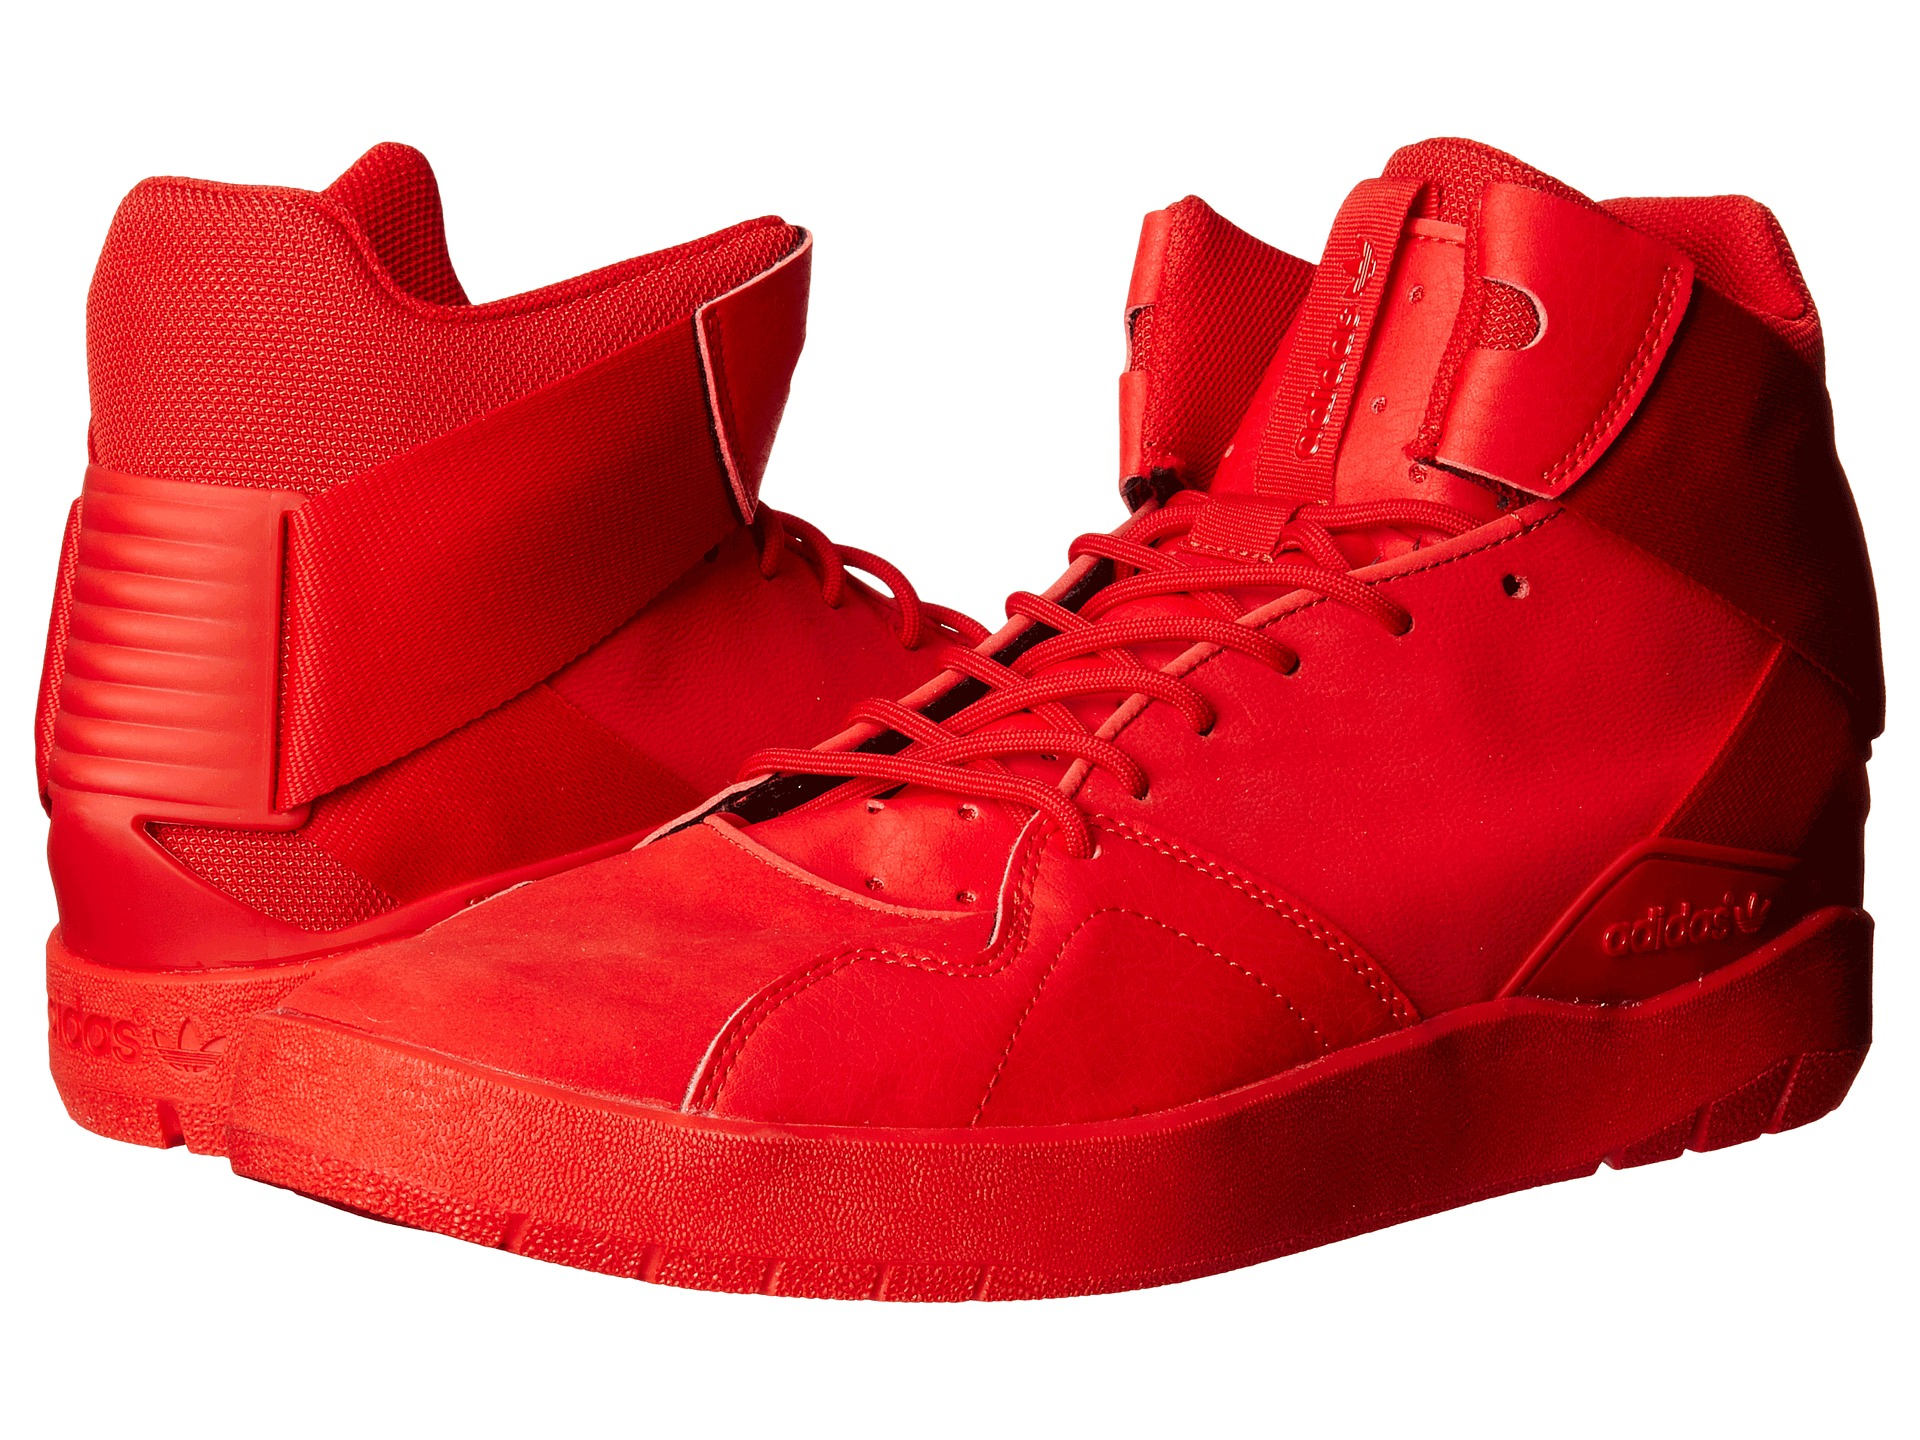 wholesale dealer dec4d 40e9d Lyst - adidas Originals Crestwood Mid in Red for Men